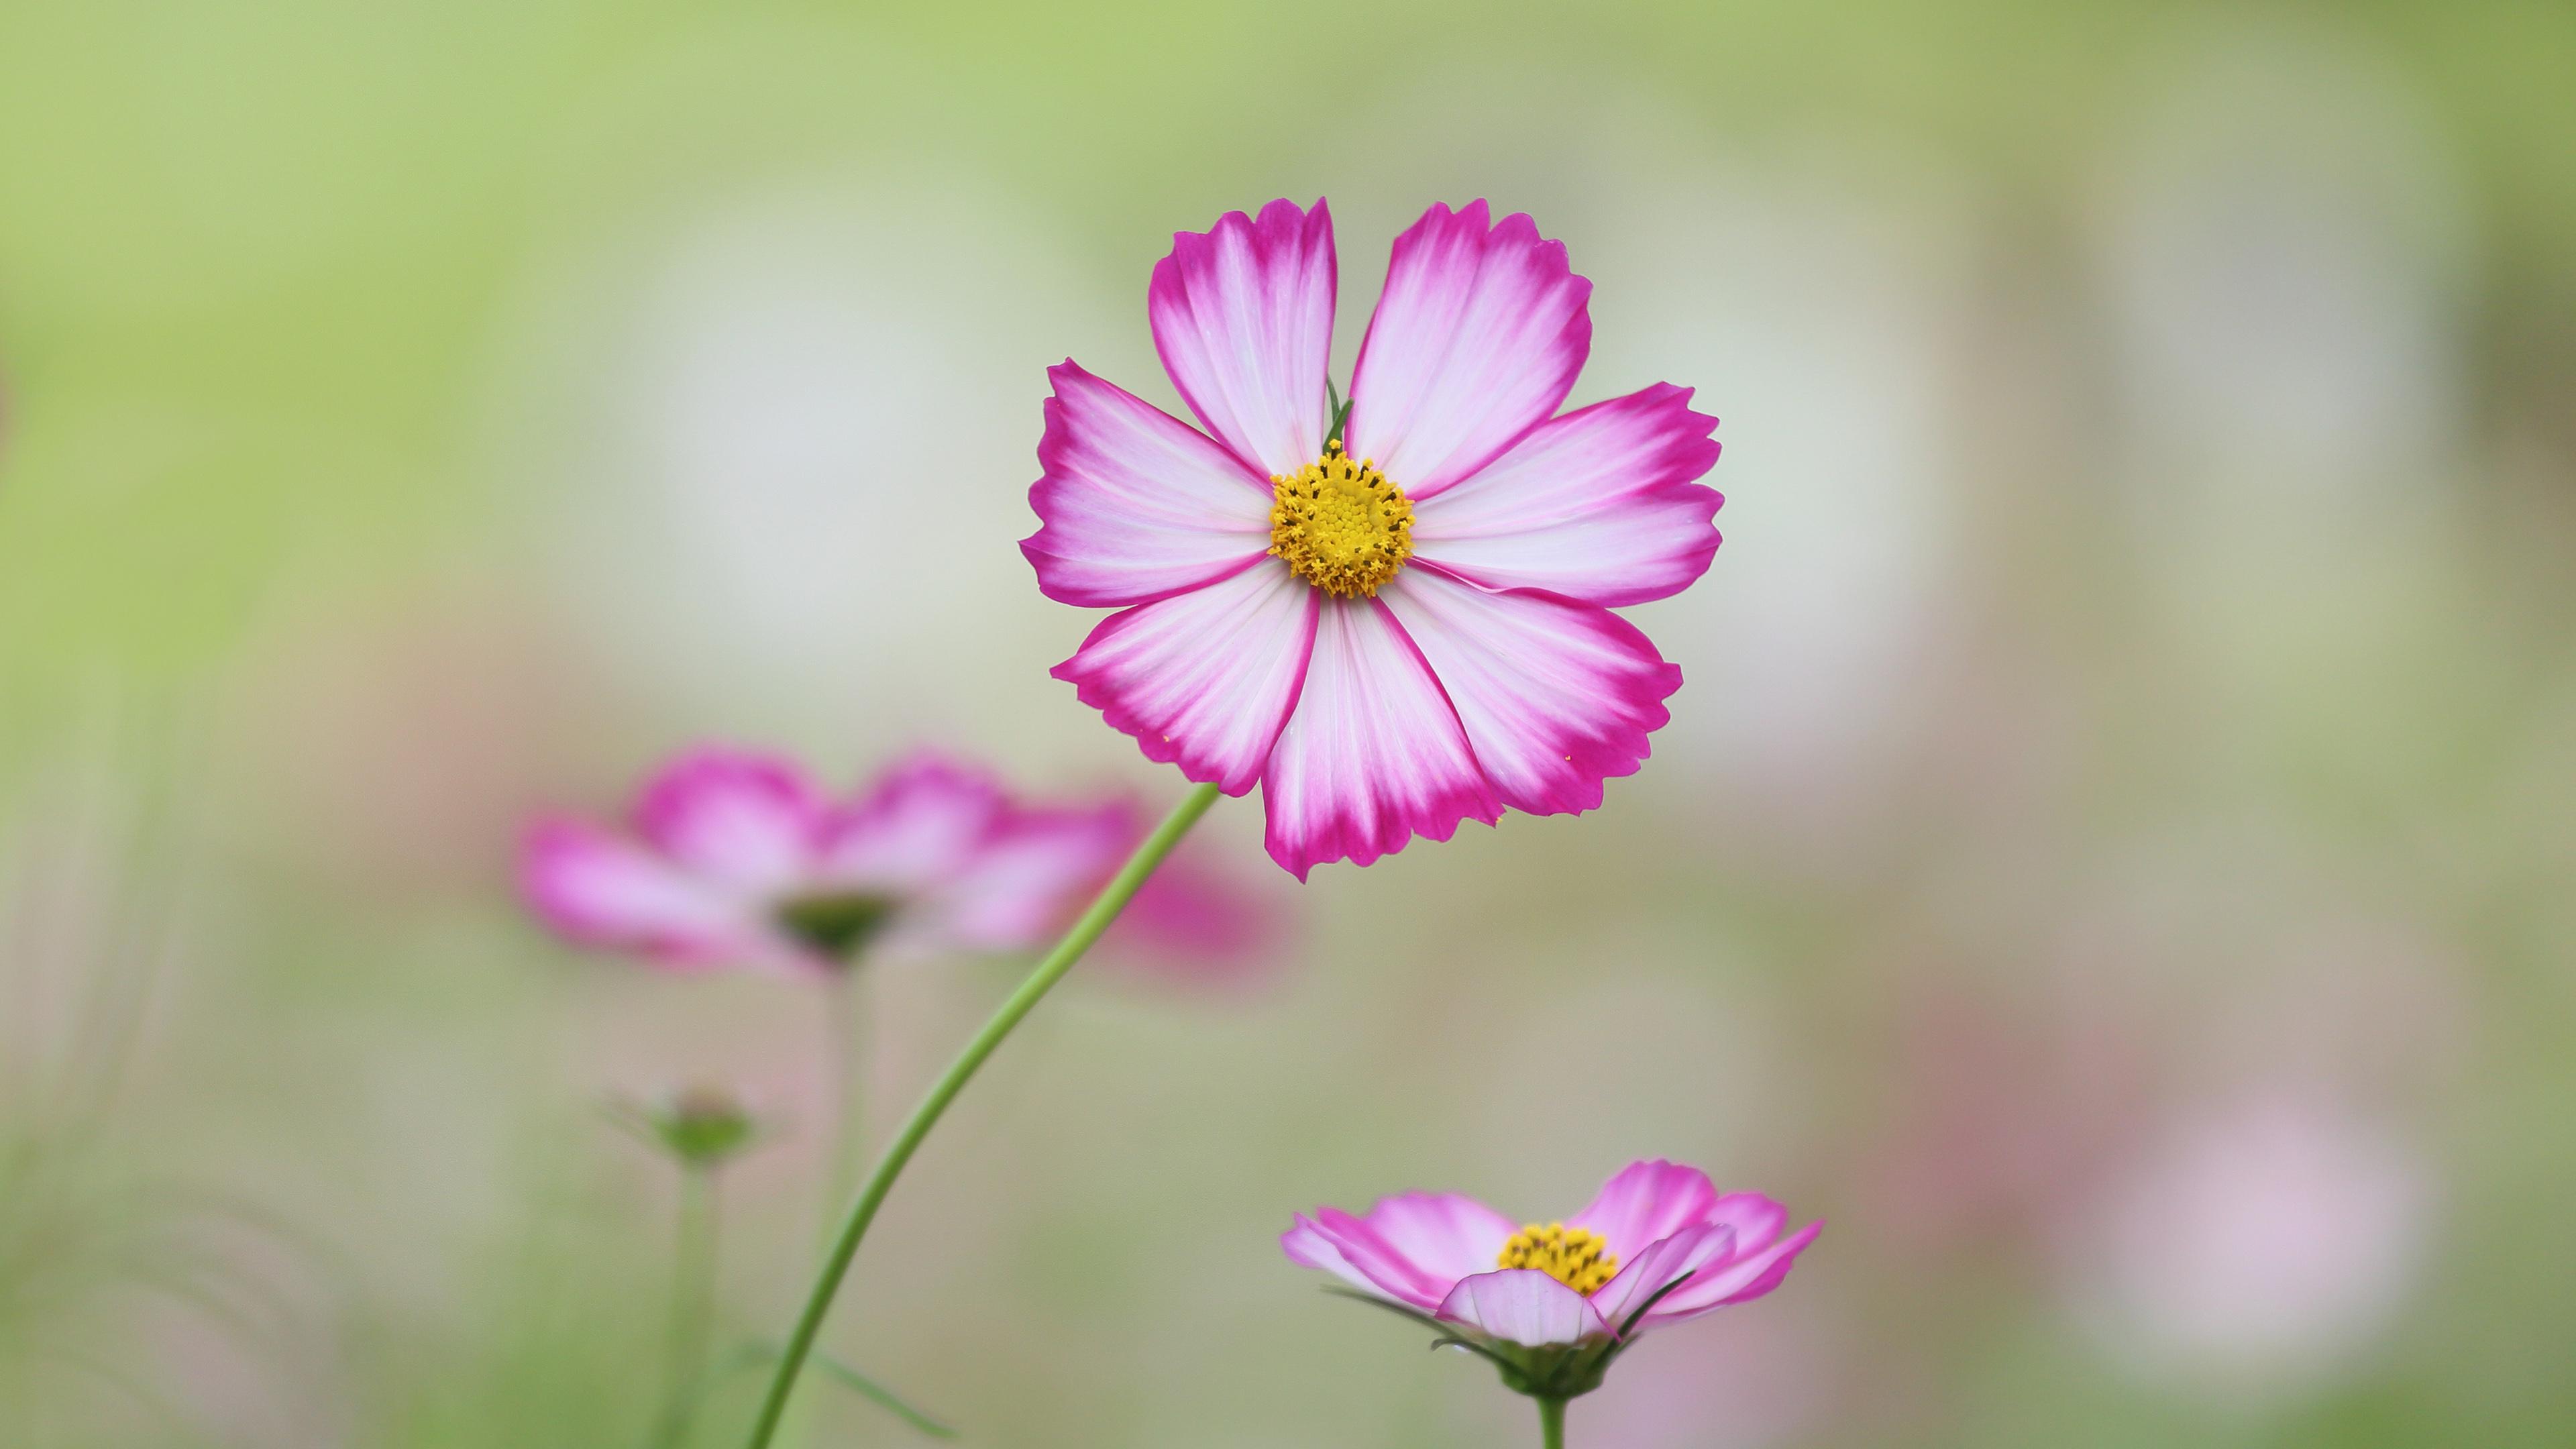 Flower 4k ultra hd wallpaper background image 3840x2160 id wallpapers id568606 download next wallpaper mightylinksfo